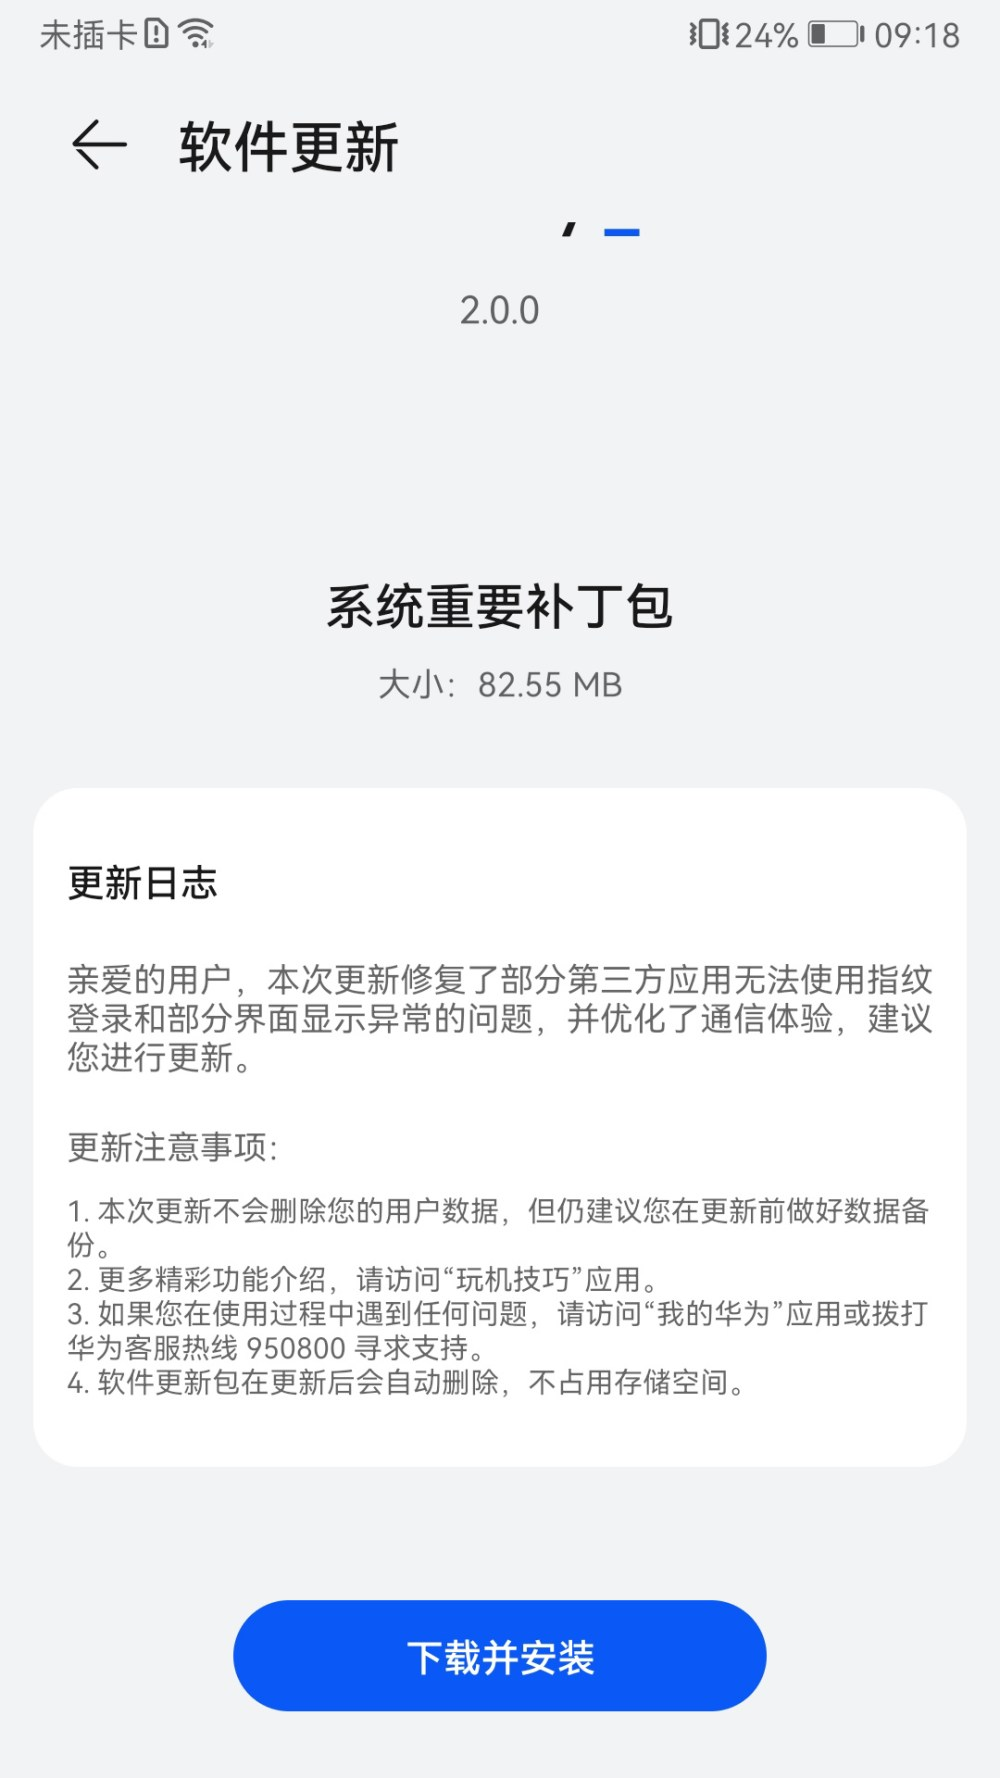 HarmonyOS 2.0 Huawei P10 Patch Update